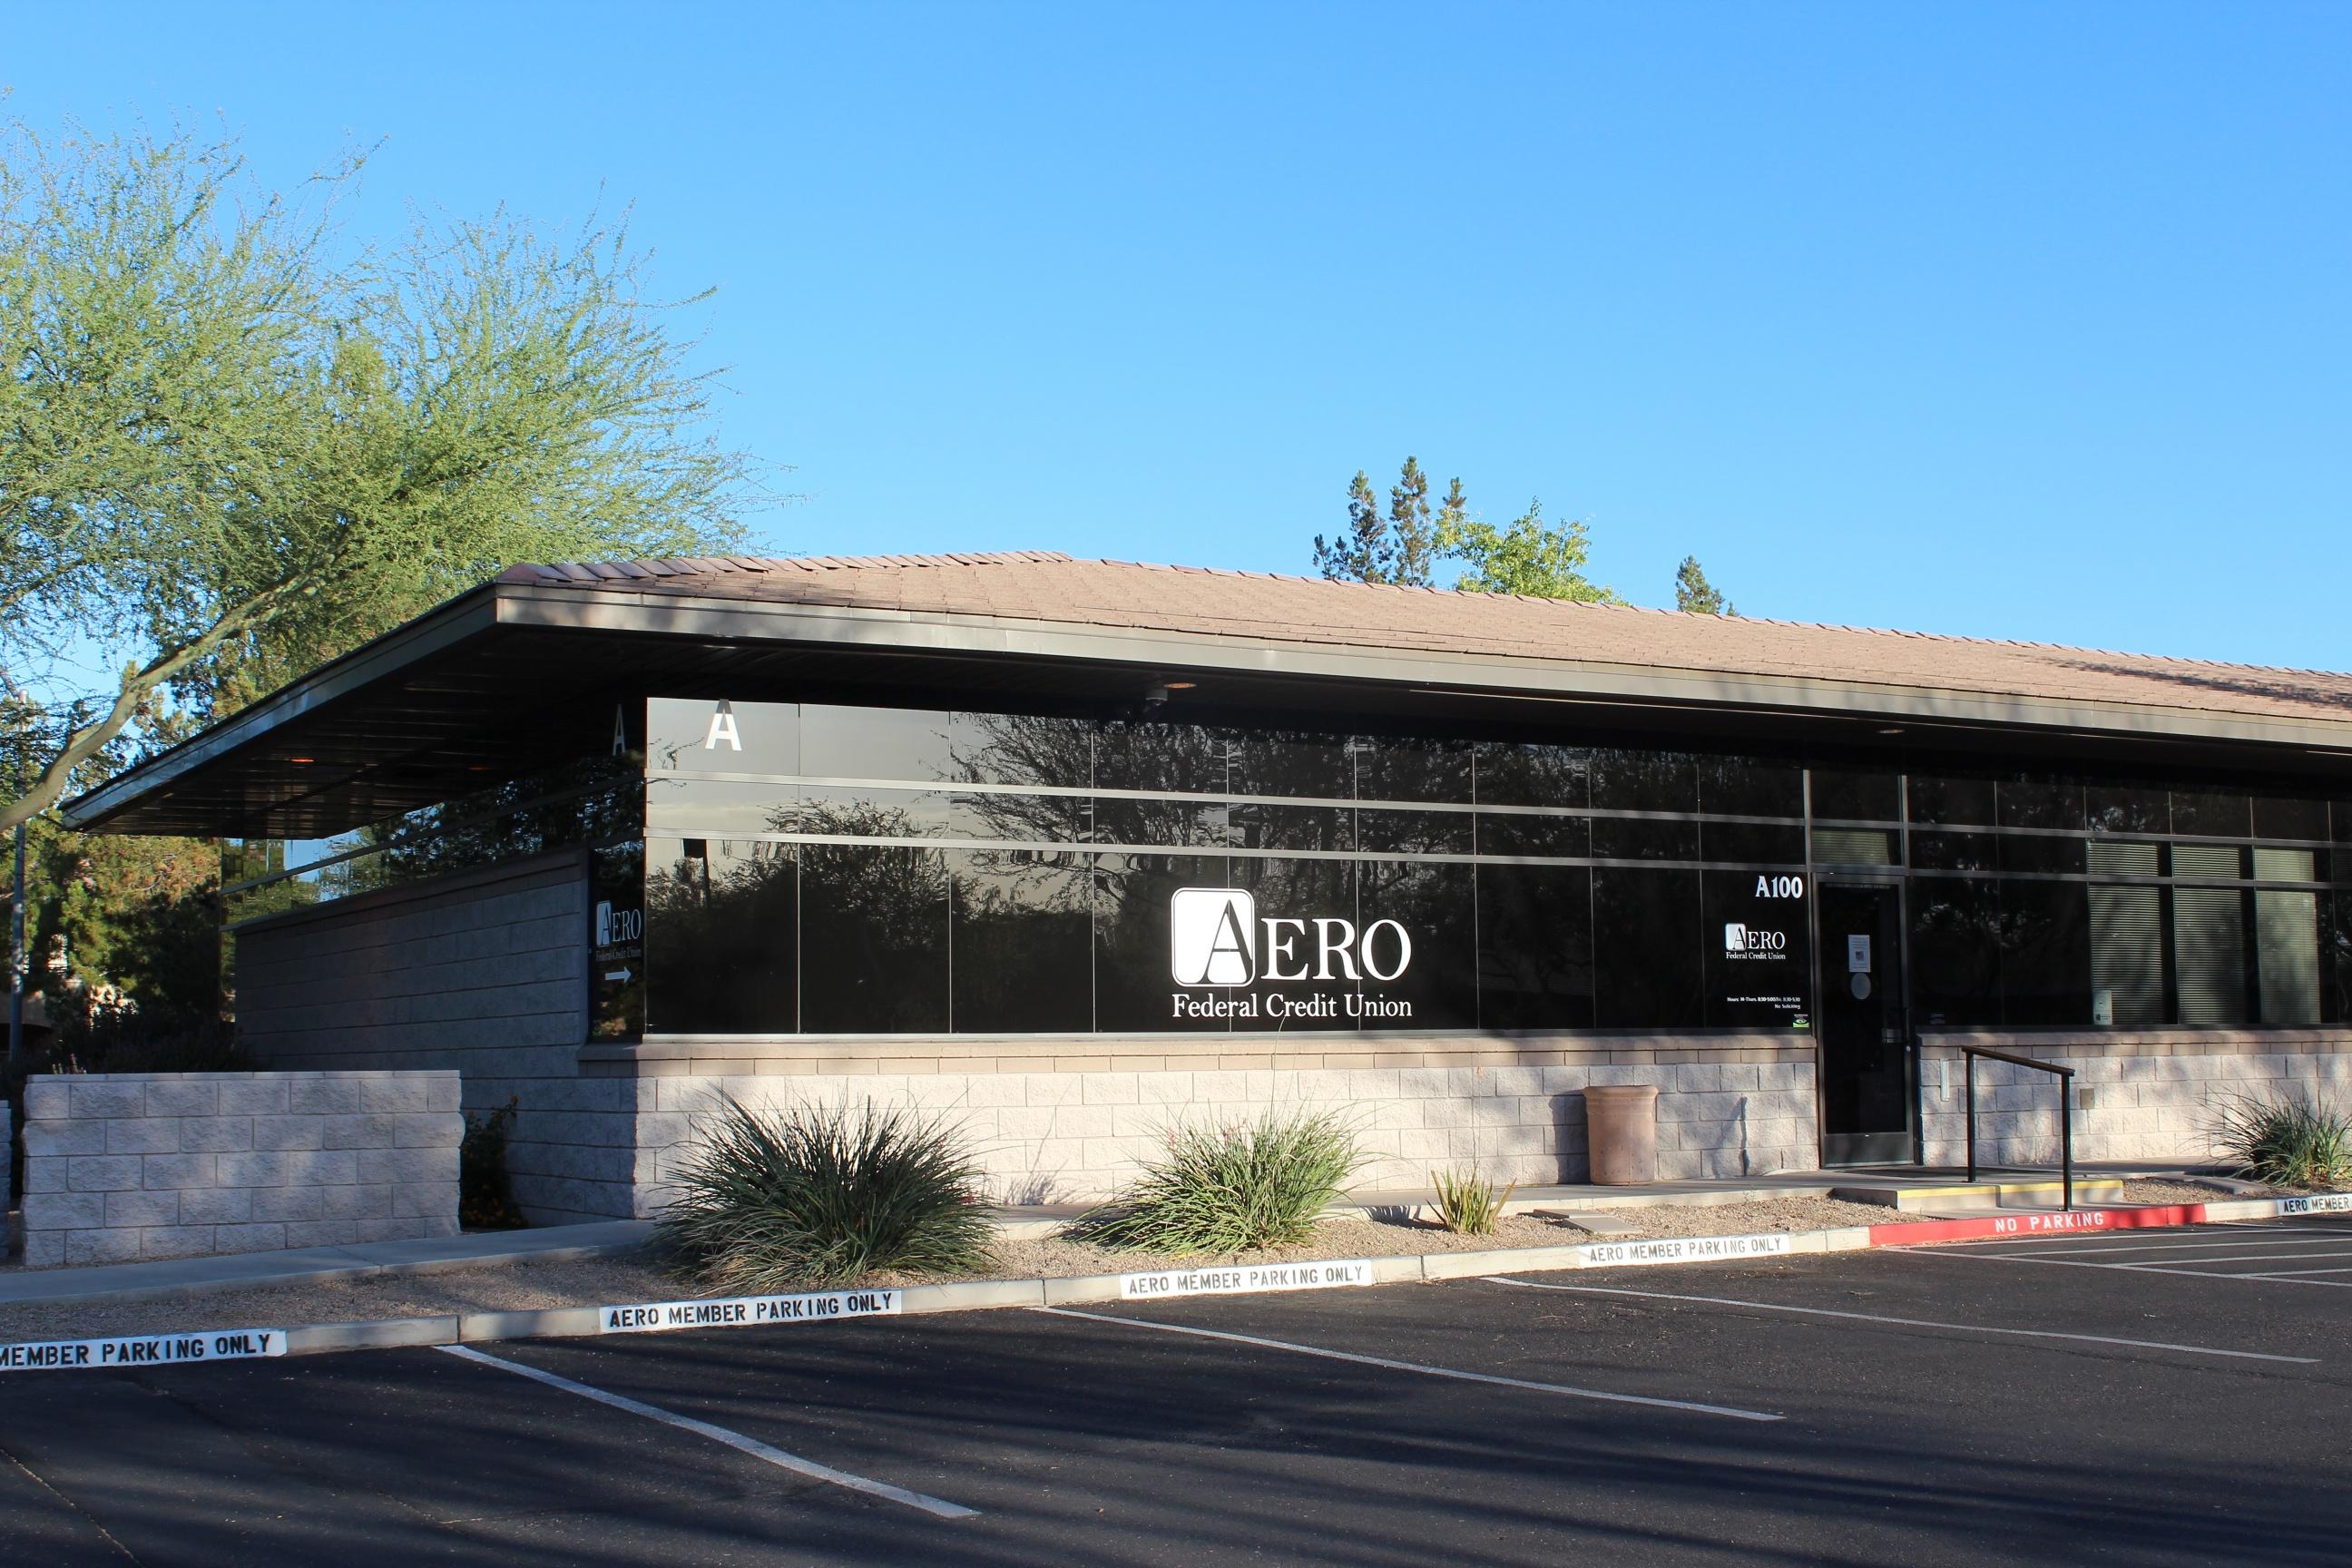 AERO branch location image